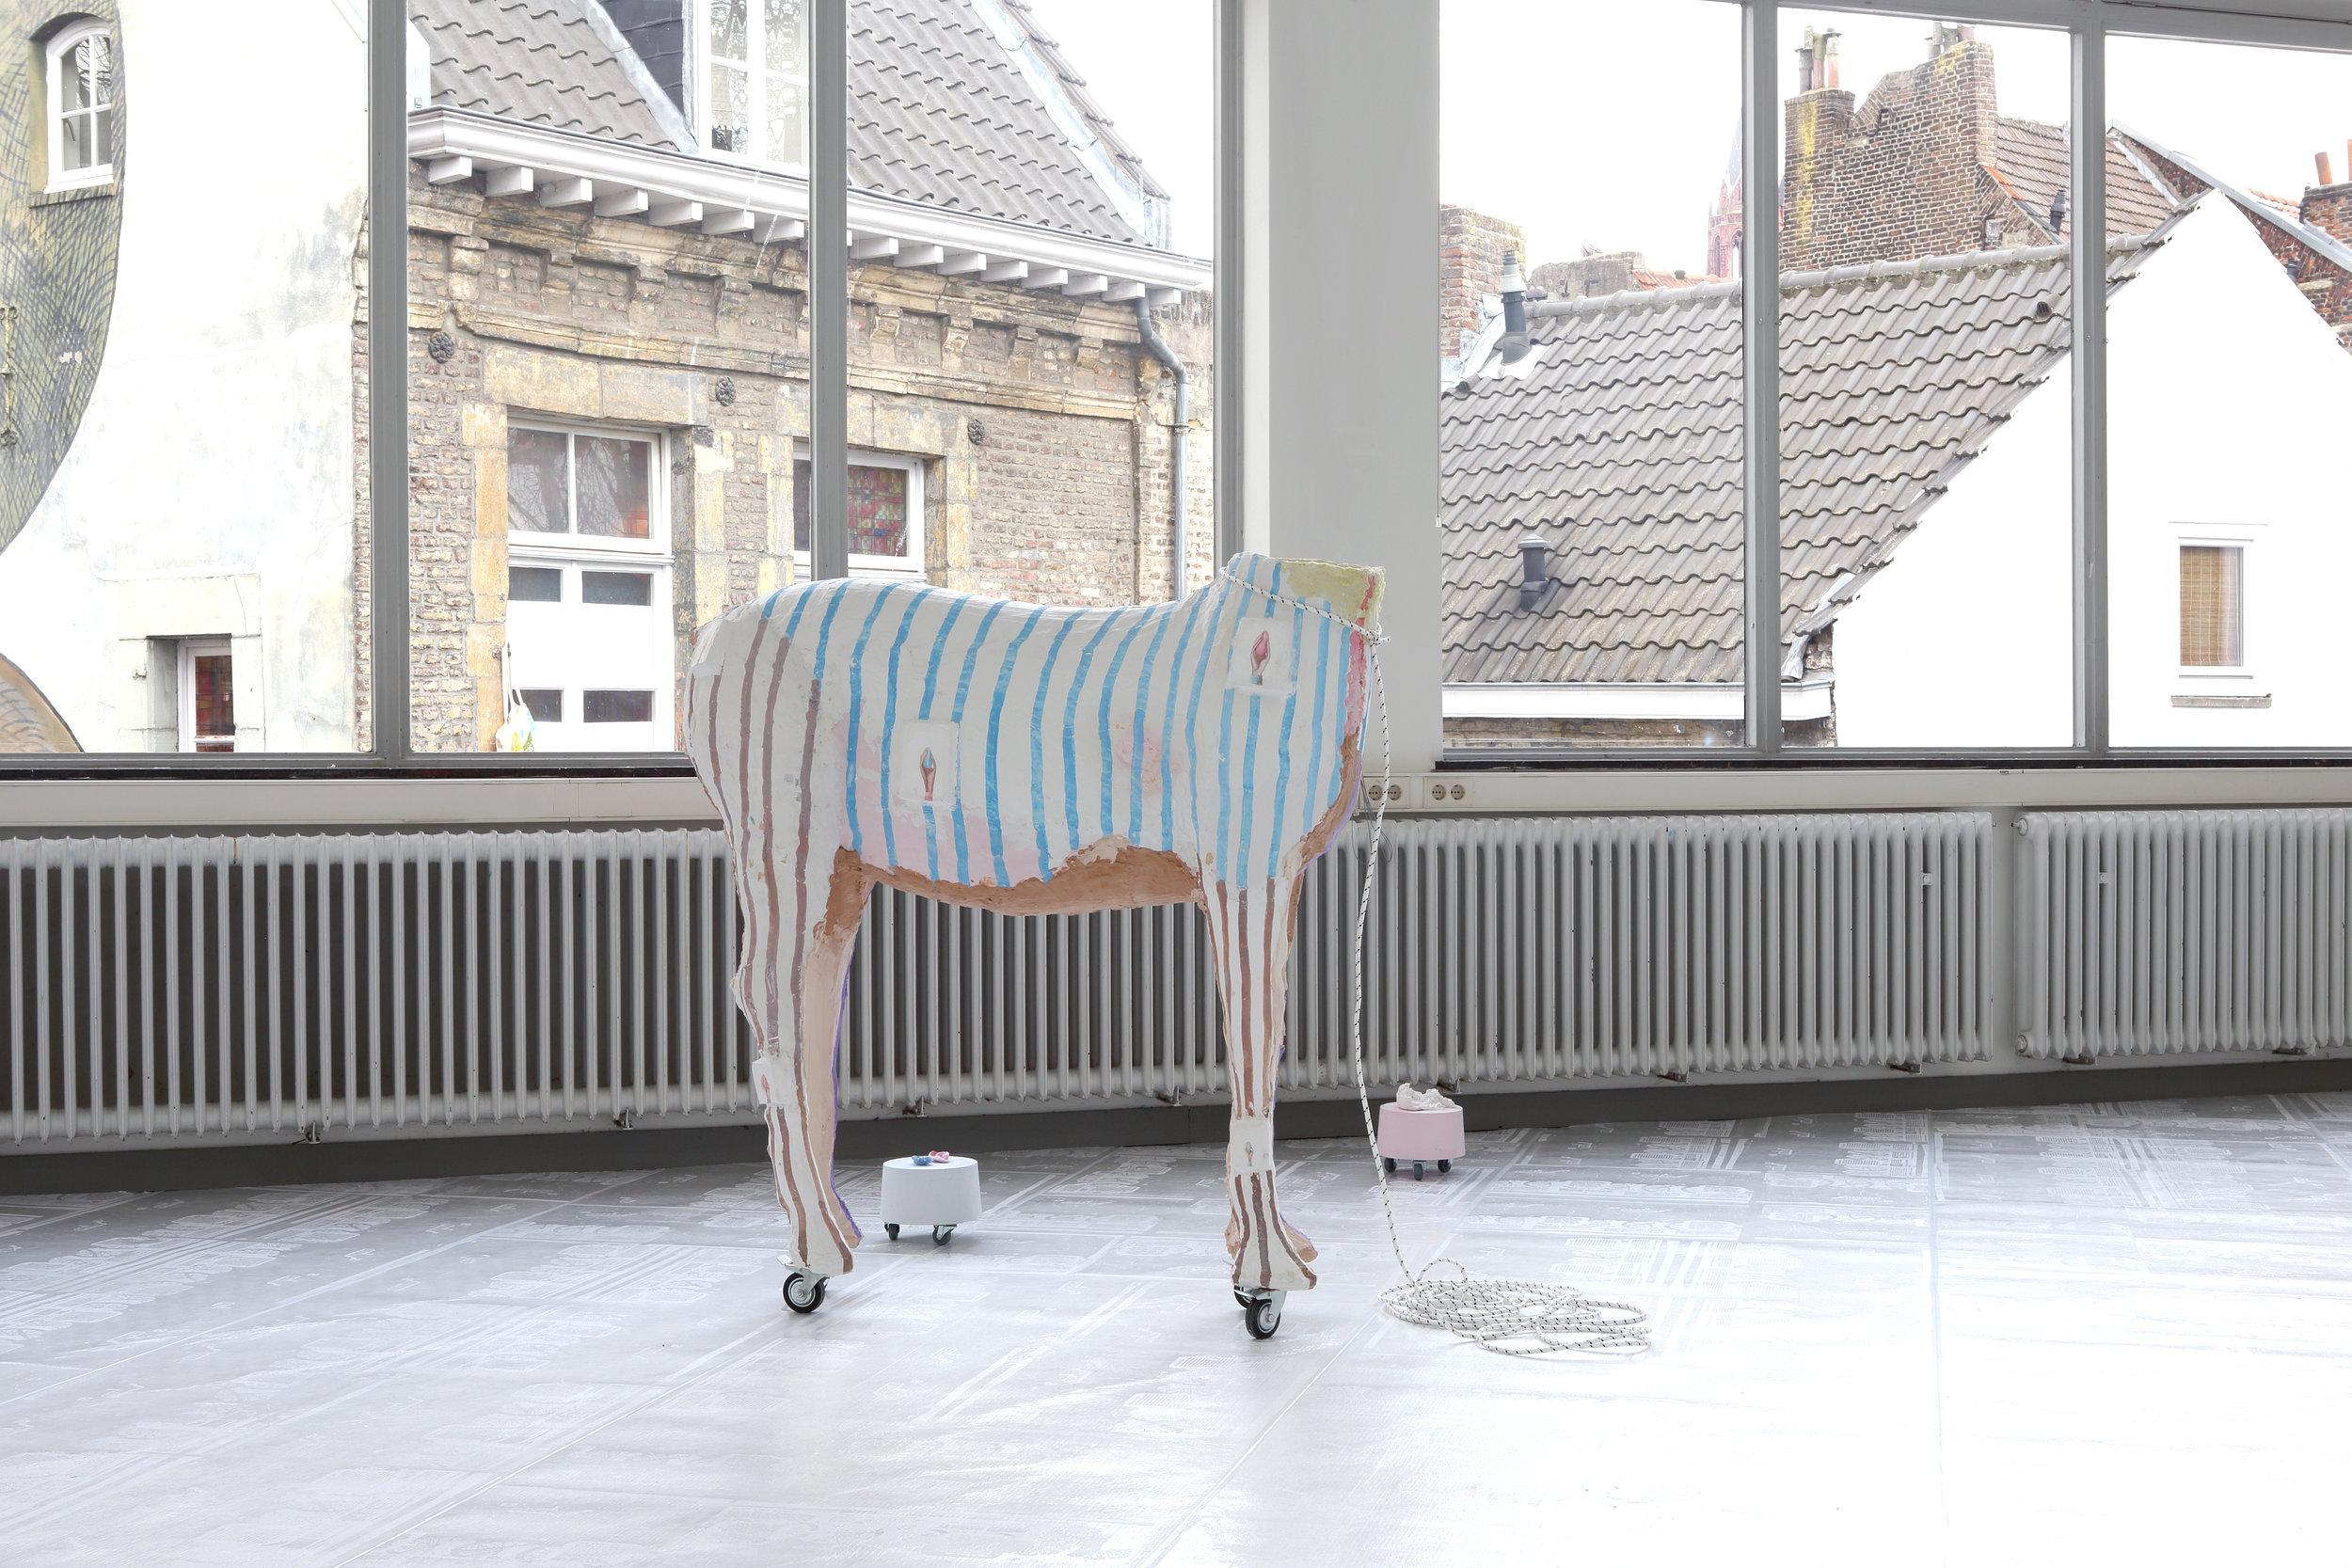 A stone is dropped, eggs mixed, pigments crushed..: Paradepaard - Open Studio's '18, Jan van Eyck Academie, 2018